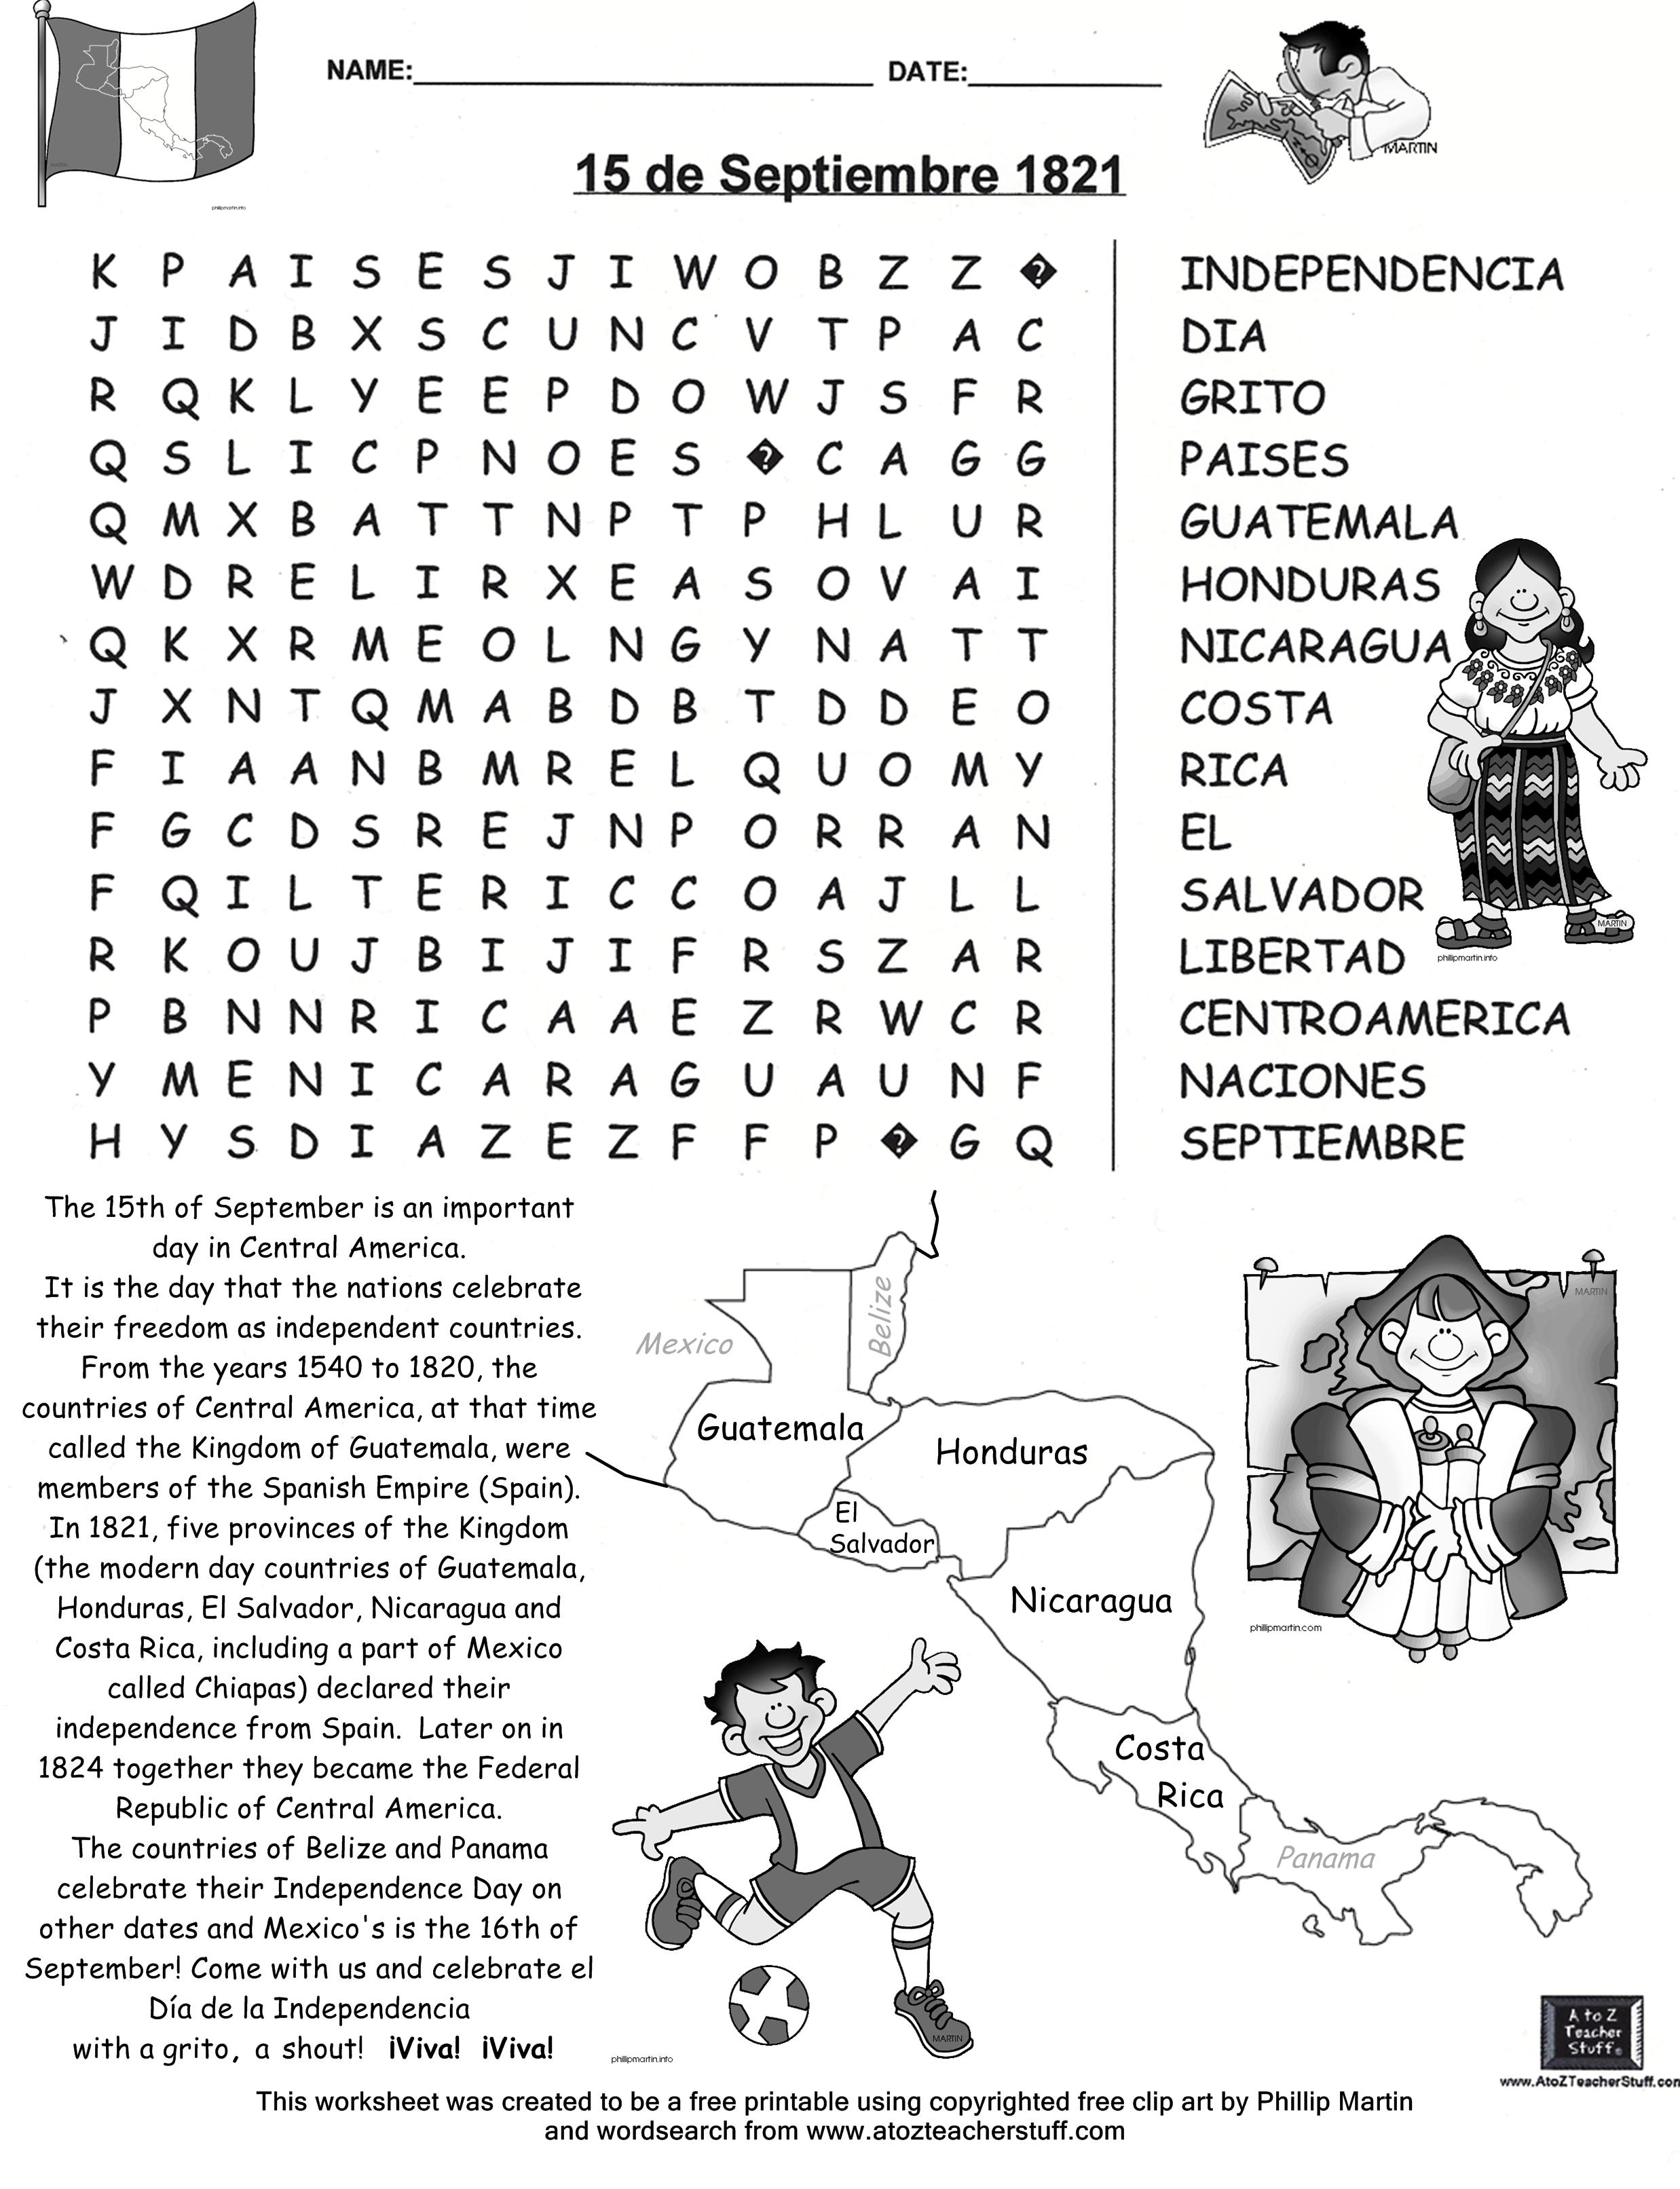 Hispanic Heritage Month Worksheets Pdf Archives - Hashtag Bg | Hispanic Heritage Month Printable Worksheets